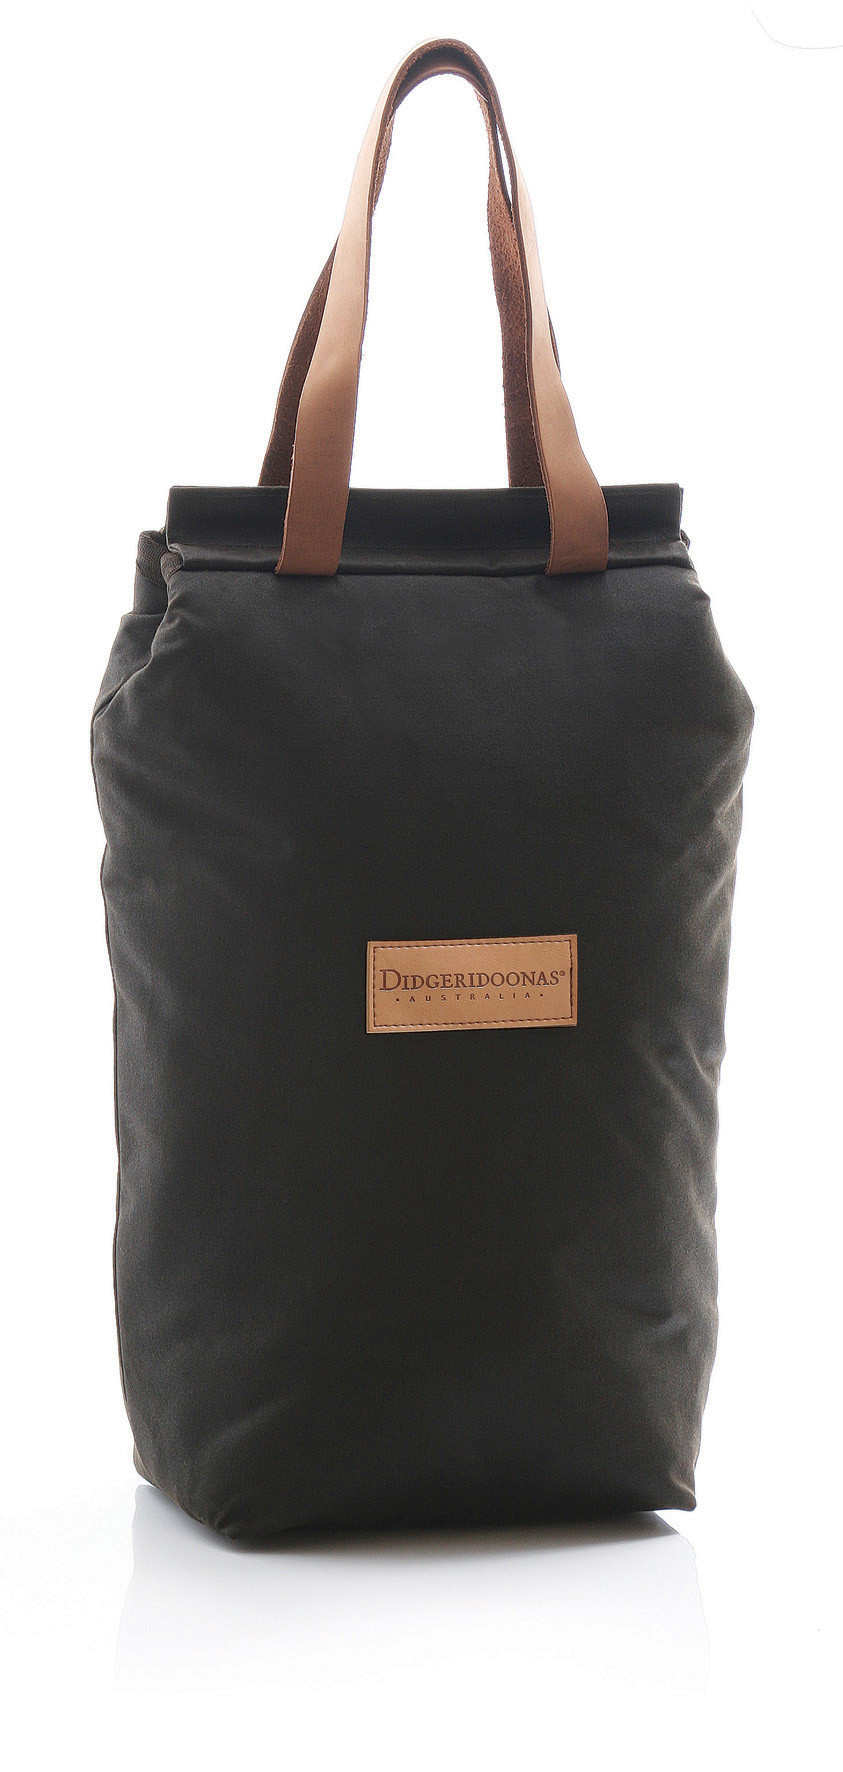 Australian BYO Cooler Bag